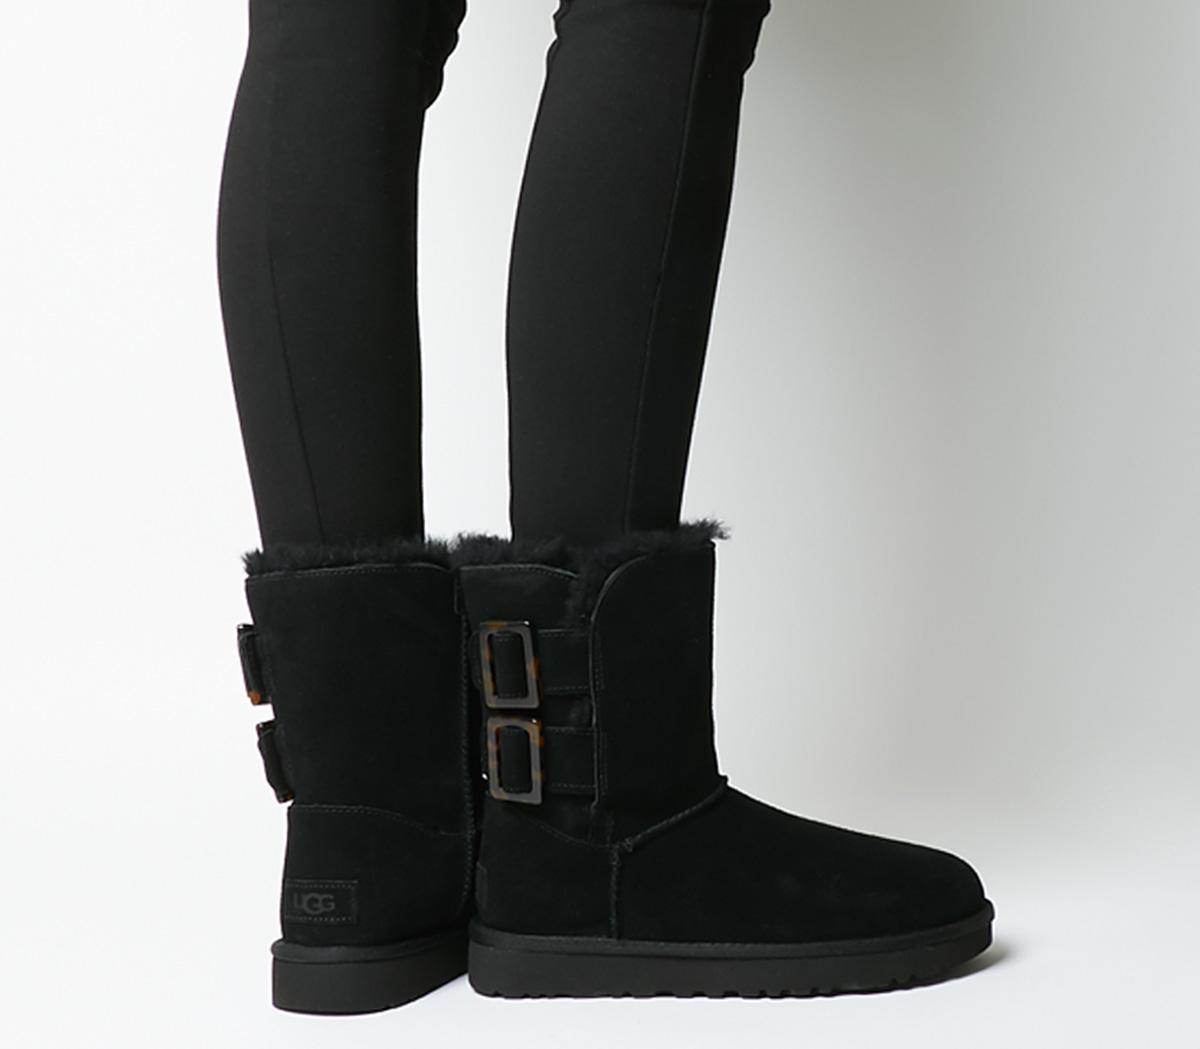 UGG Bailey Fashion Buckle Boots Black